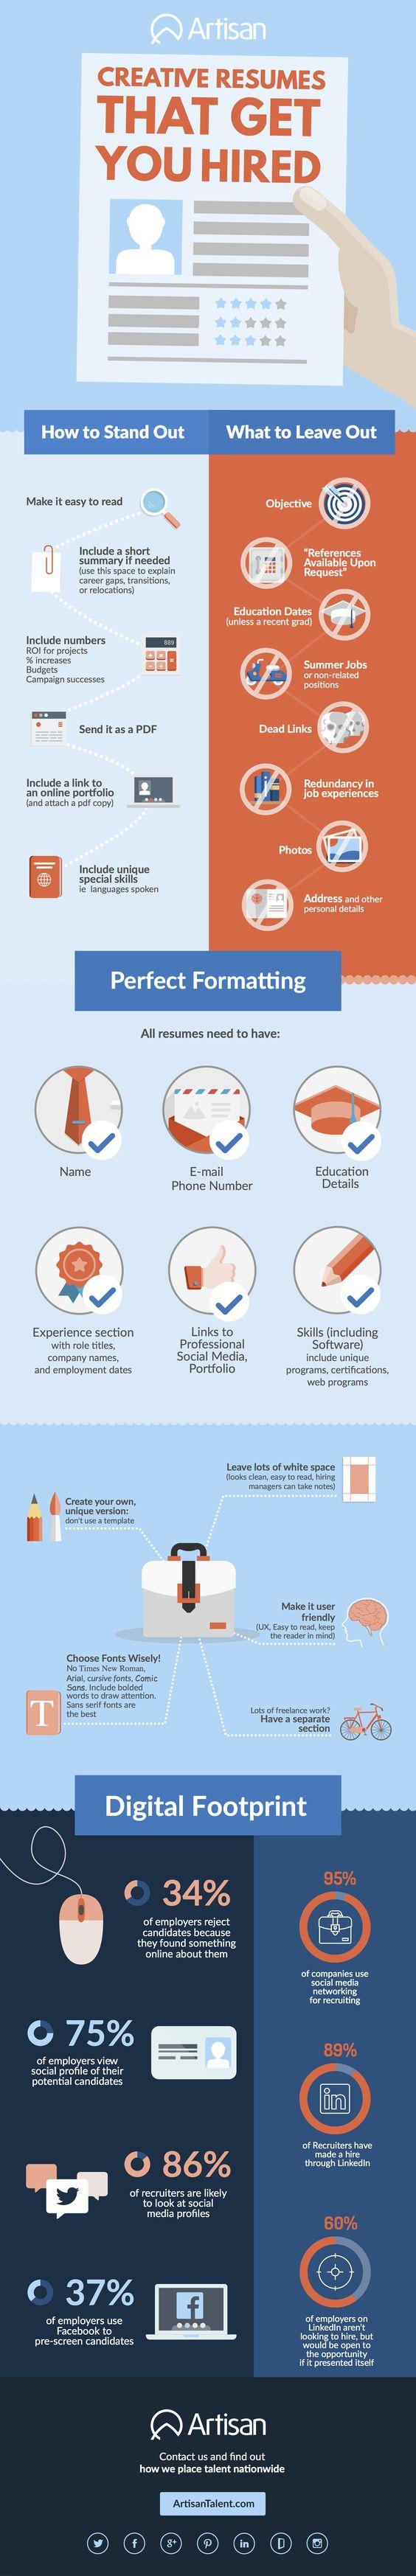 Job Resume Correct Spelling Graduation Requirements MDE